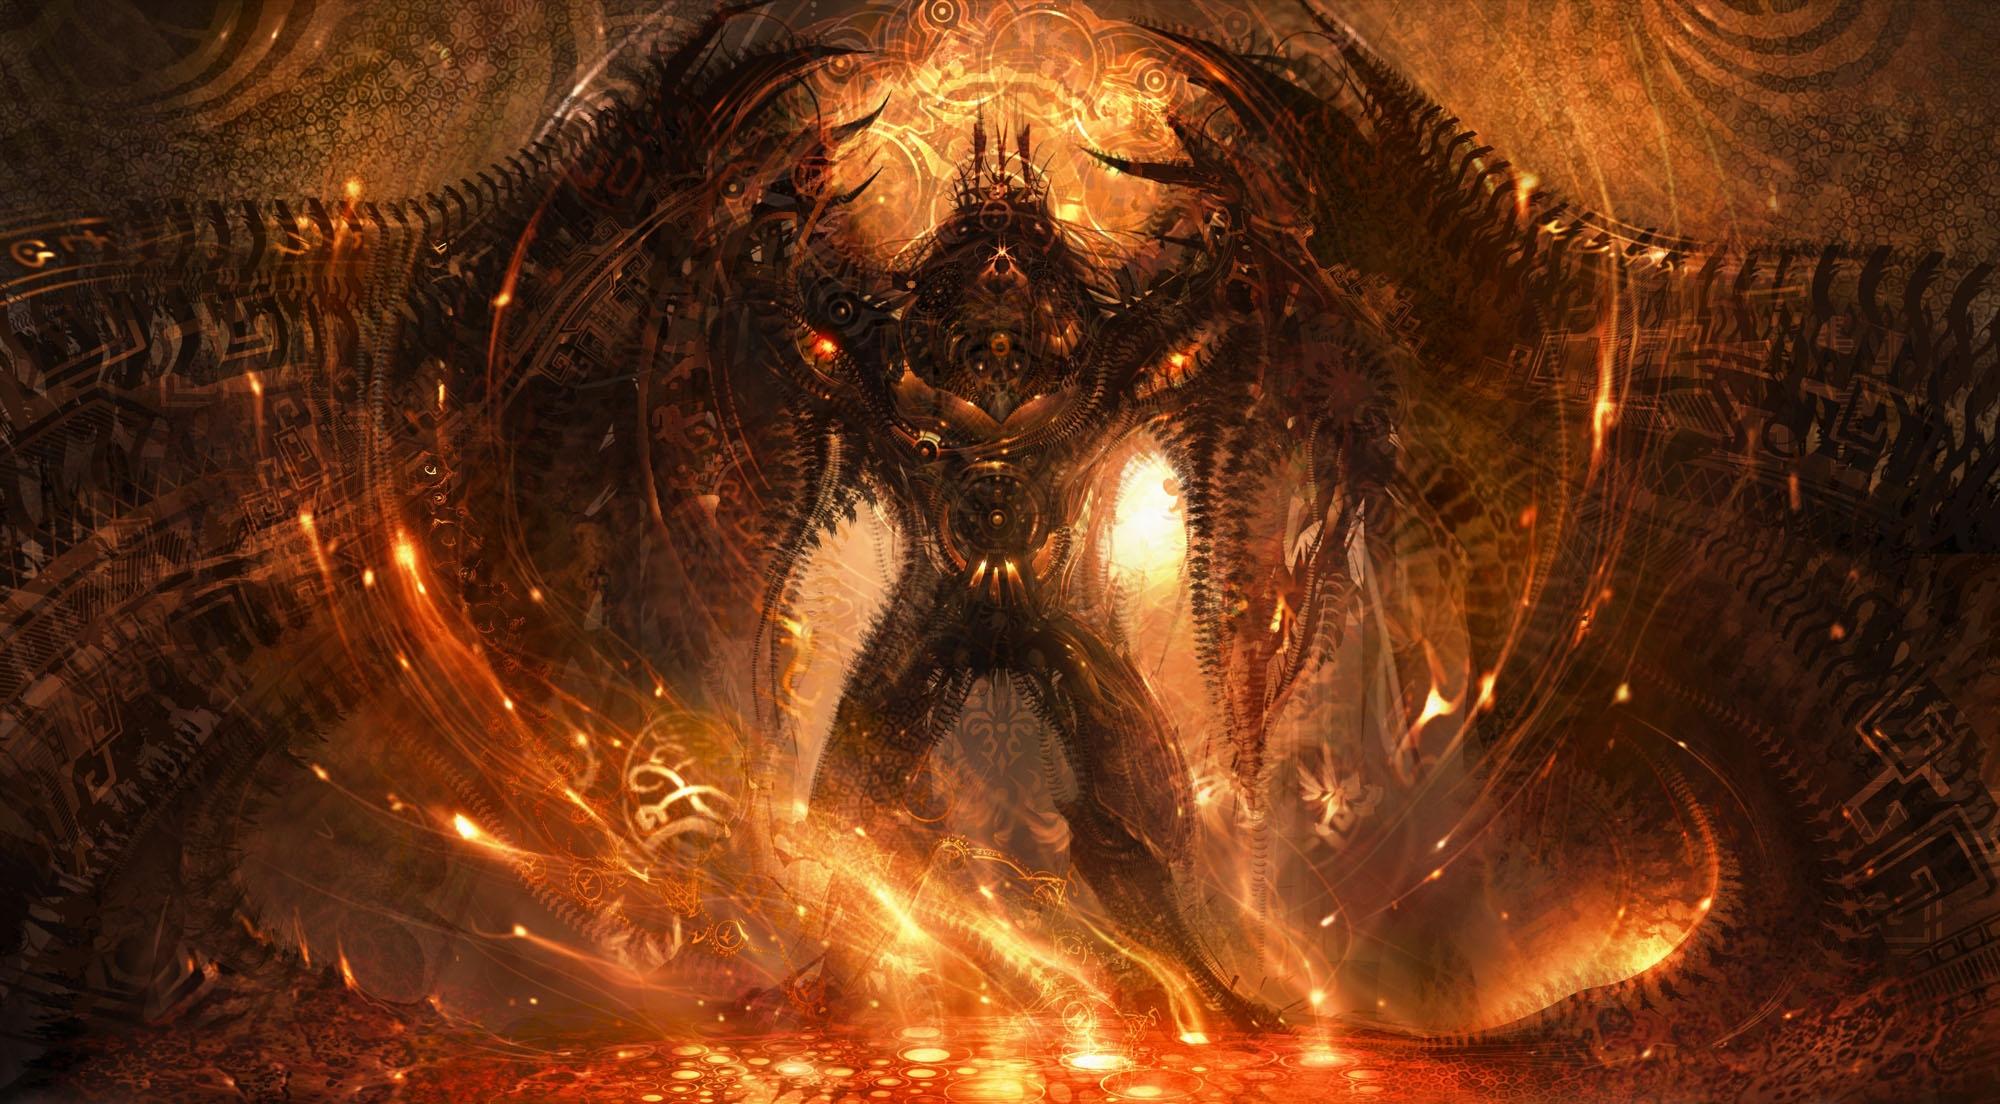 Dark Demon Wallpaper 2000x1104 Dark Demon 2000x1104